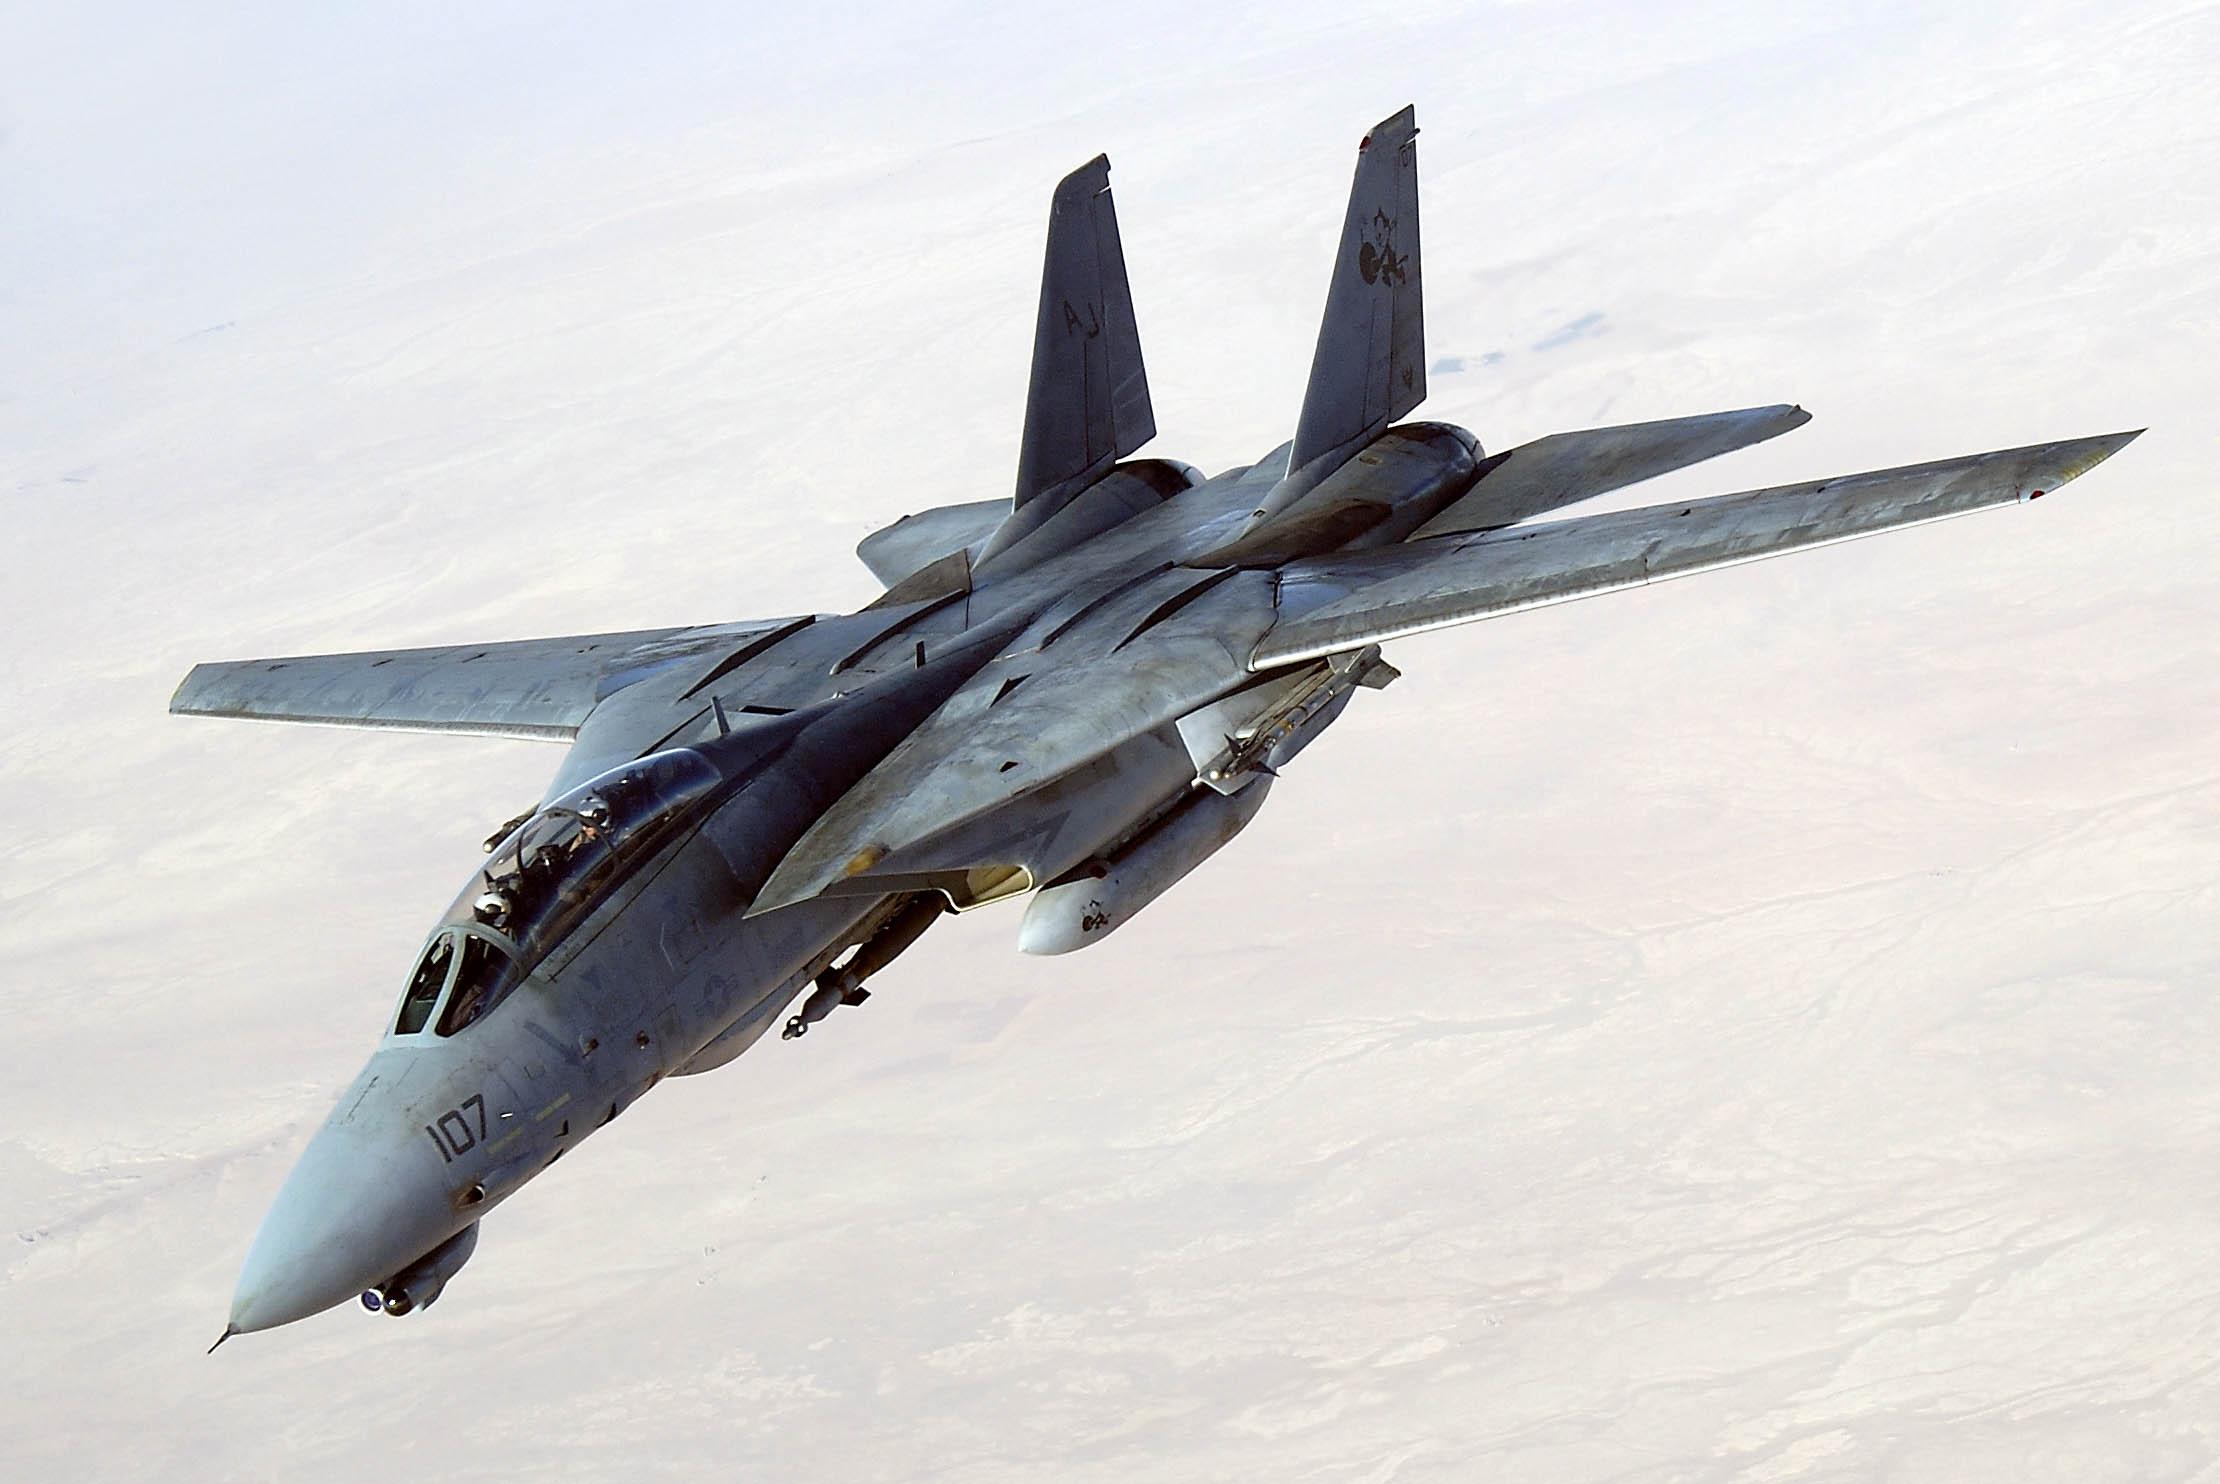 Military moc 7618 grumman f-14 tomcat by jerry mocbrickland